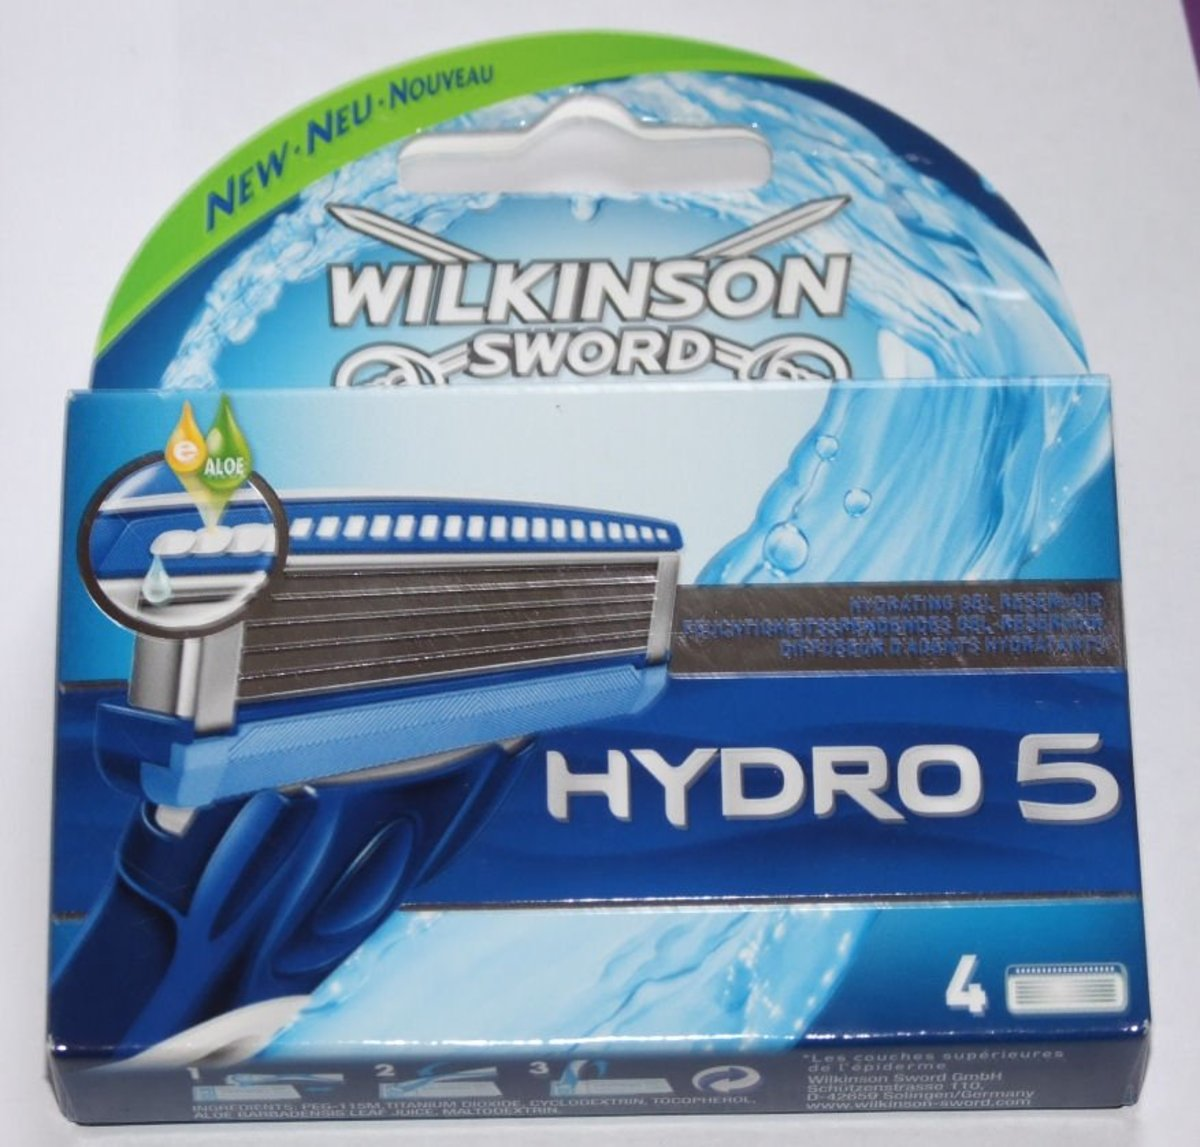 the Hydro 5 Blades